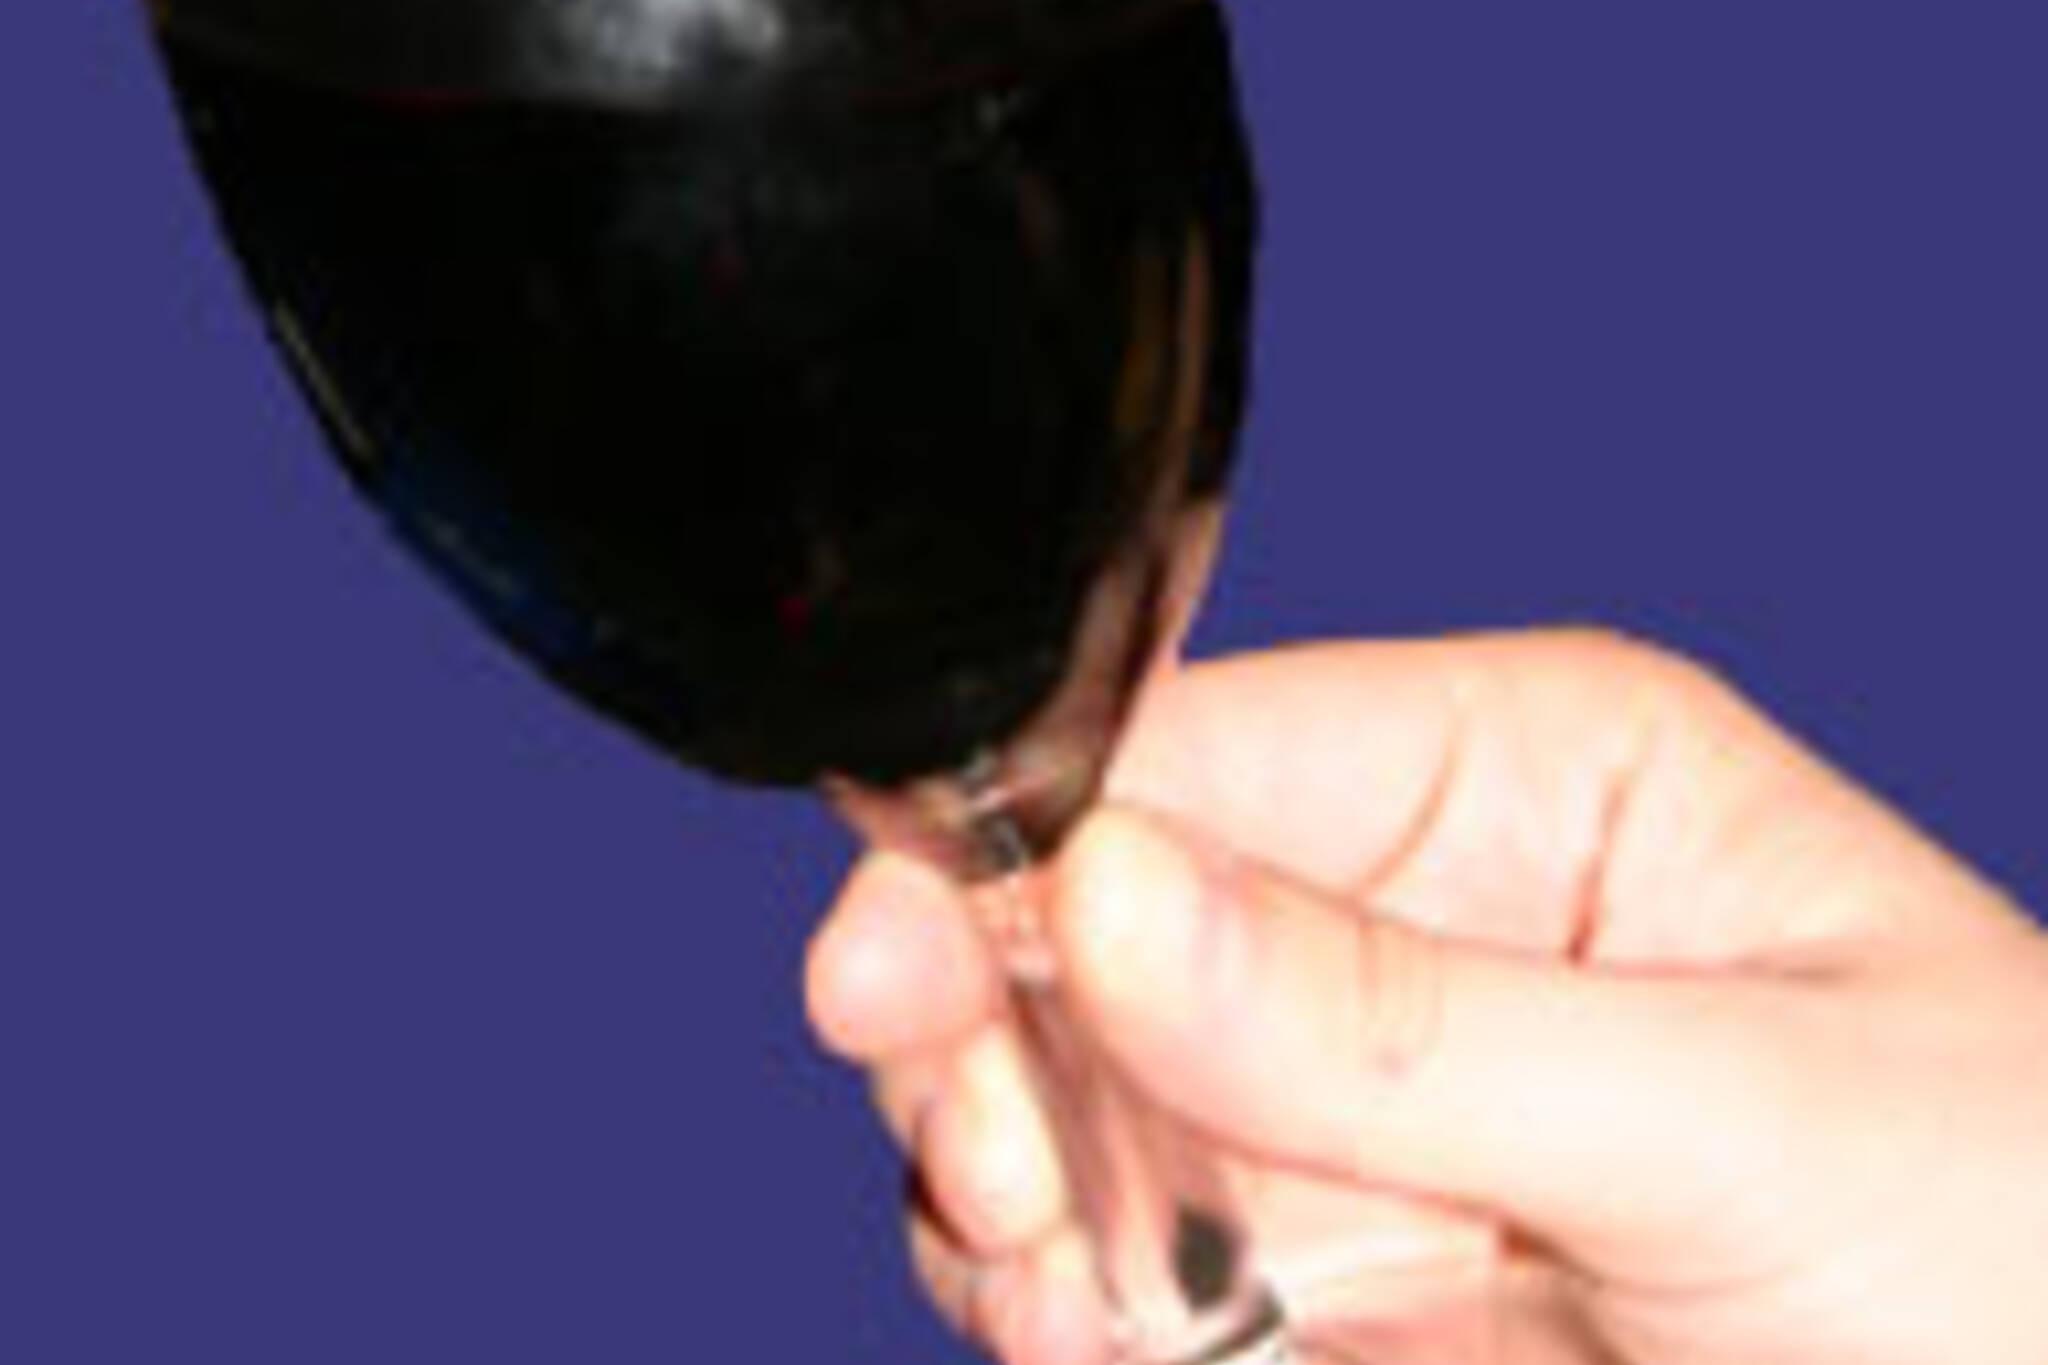 Ahhh, the joys of a nice red wine.